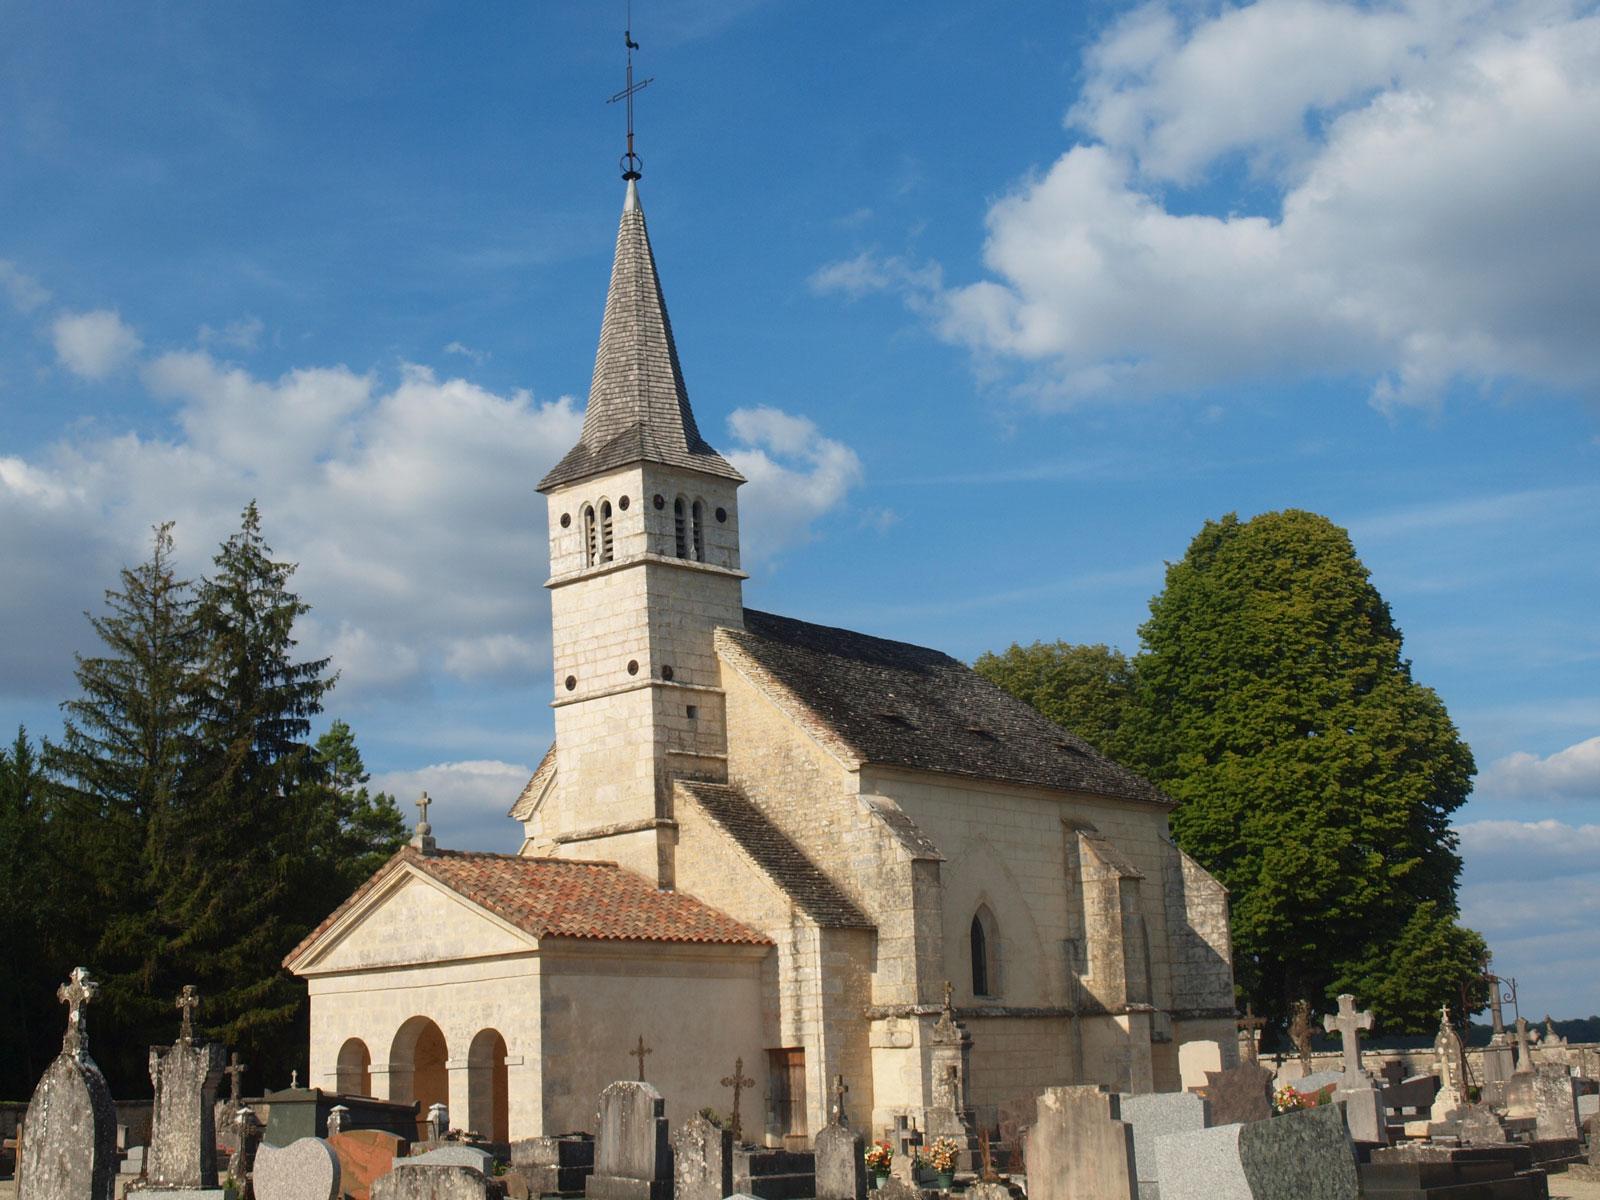 Eglise Saint-Phal - Hervé Vieulès